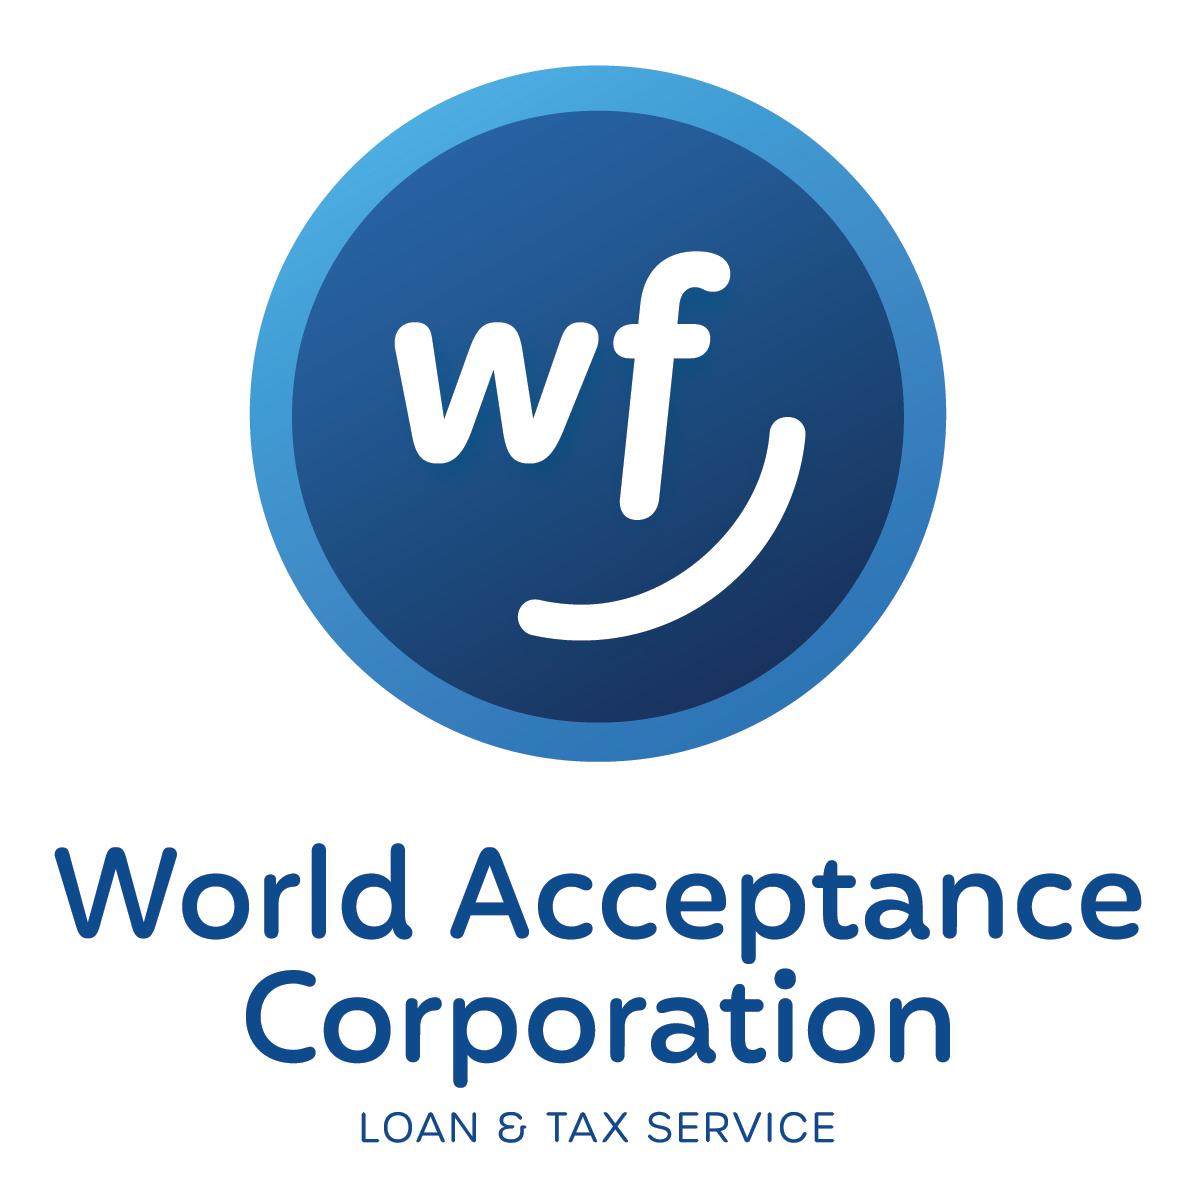 World Acceptance Corporation logo